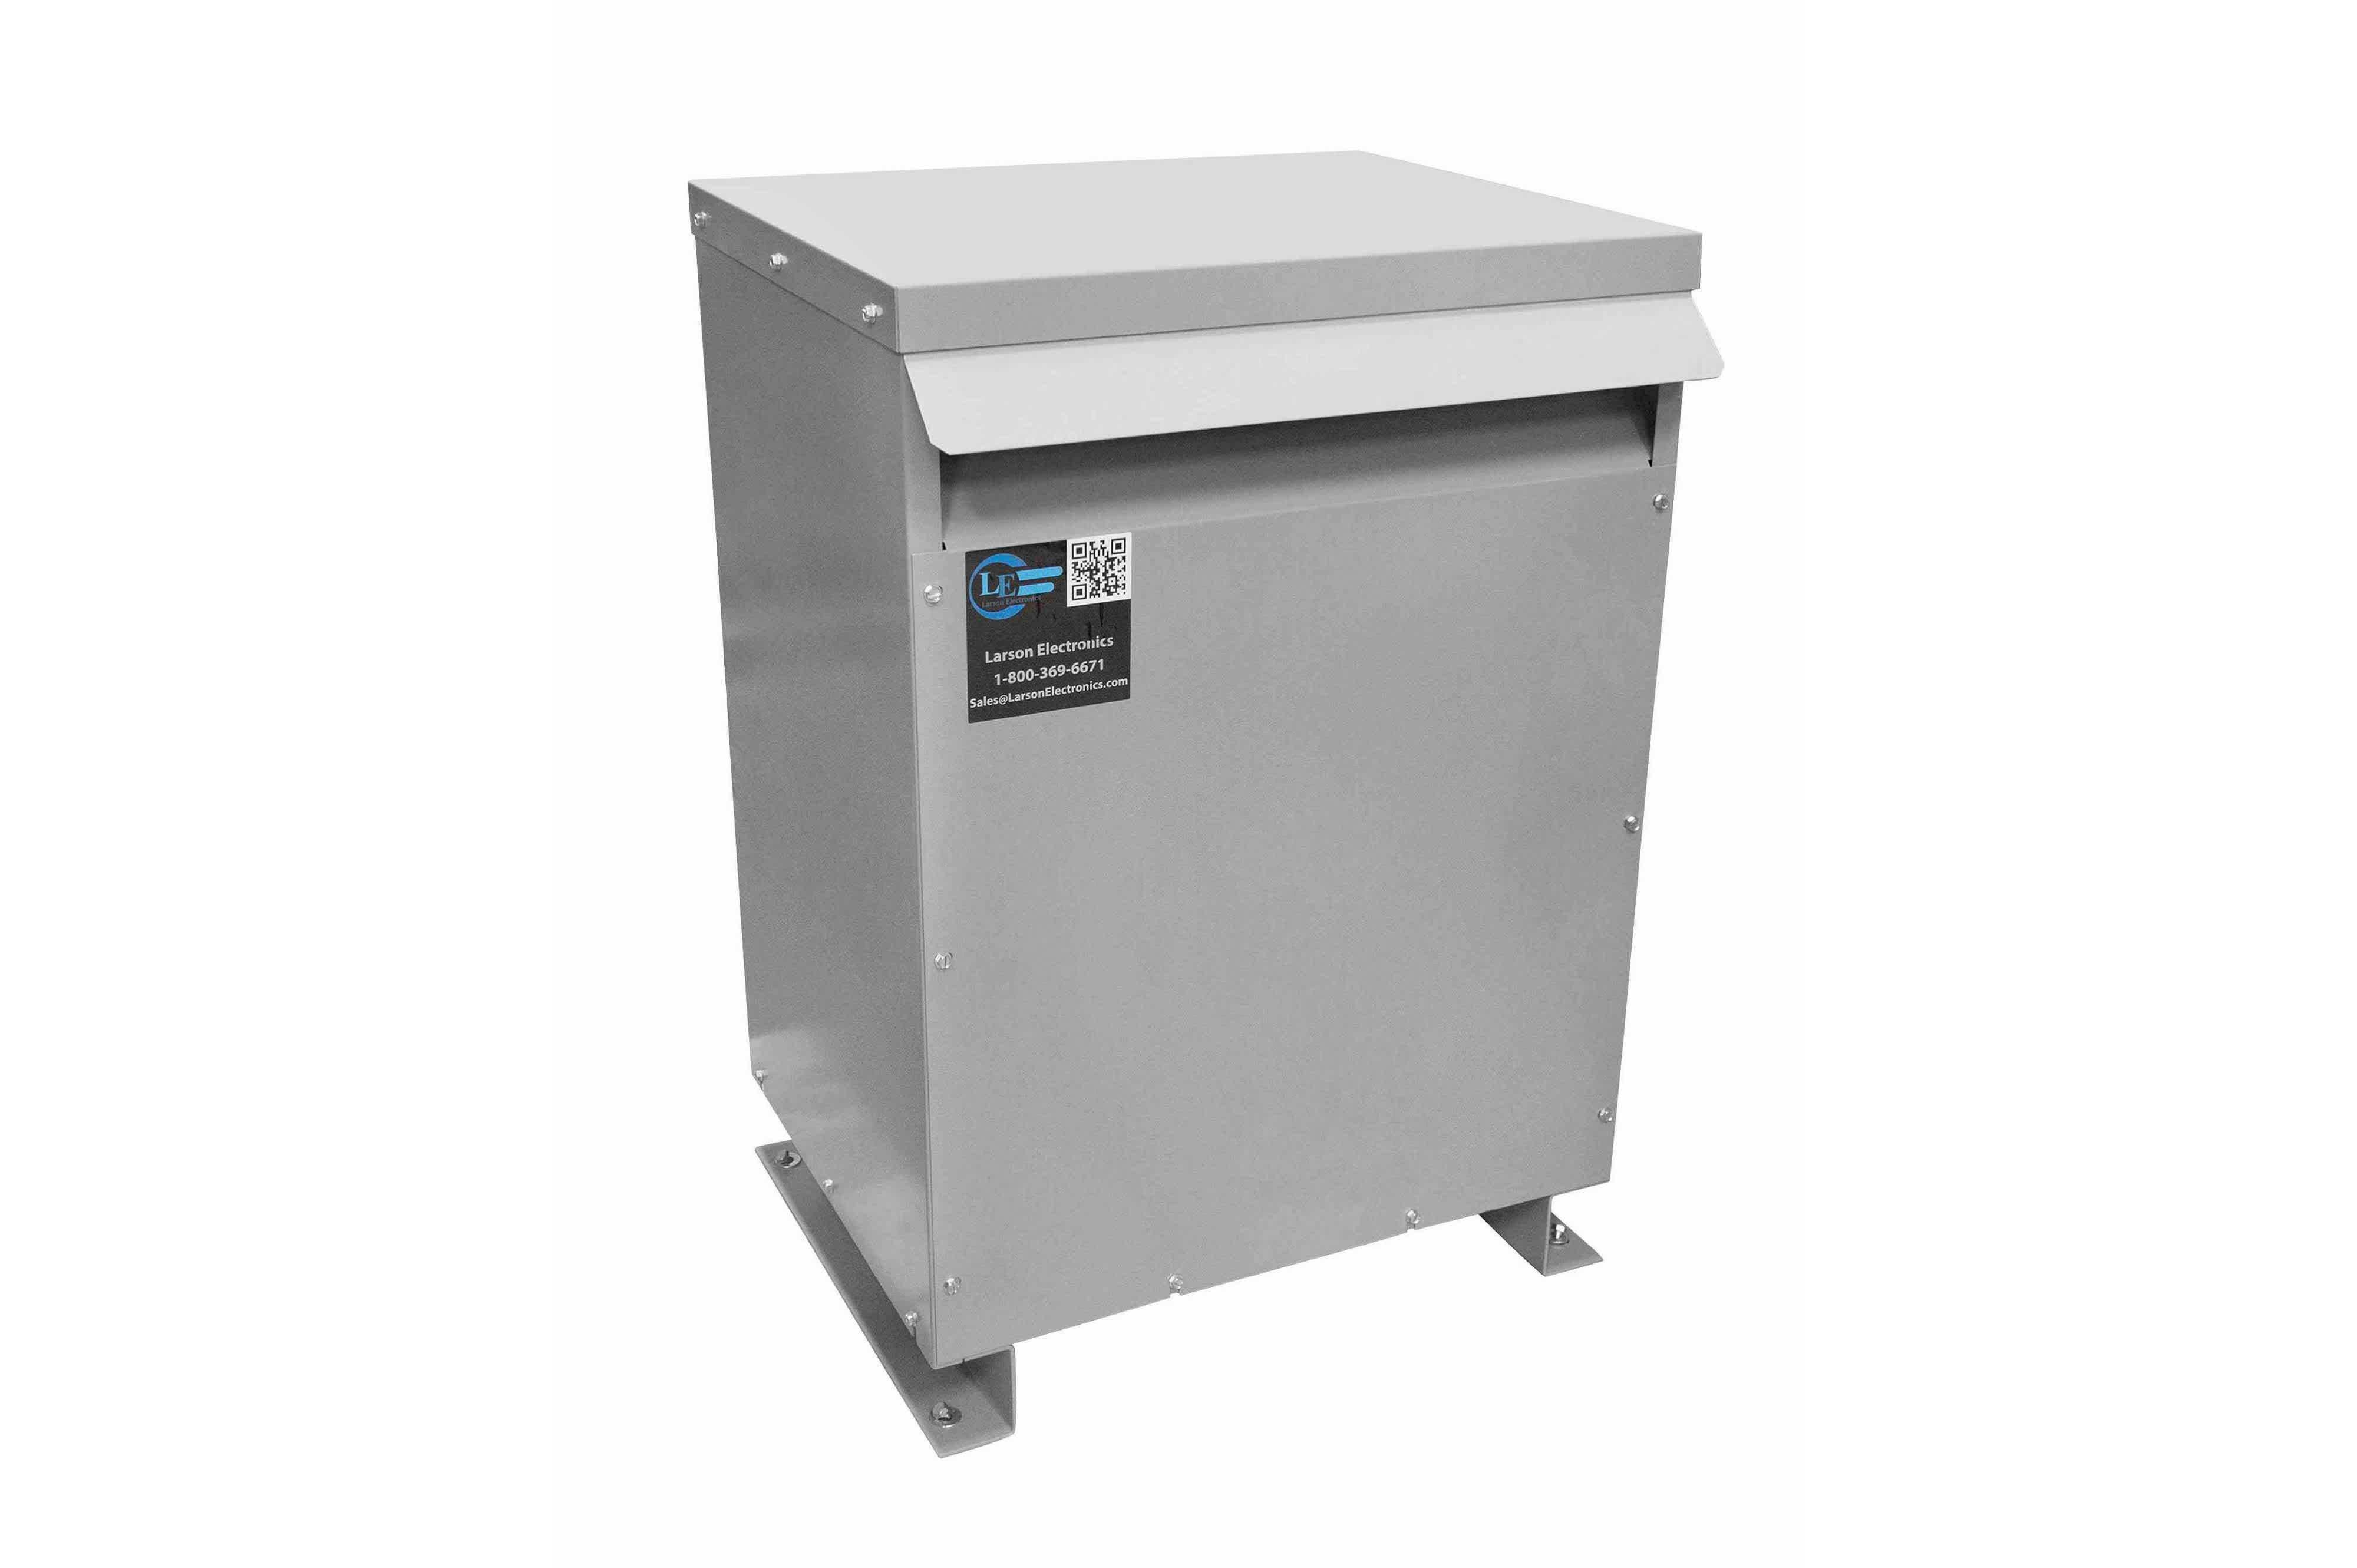 27 kVA 3PH Isolation Transformer, 230V Wye Primary, 208Y/120 Wye-N Secondary, N3R, Ventilated, 60 Hz